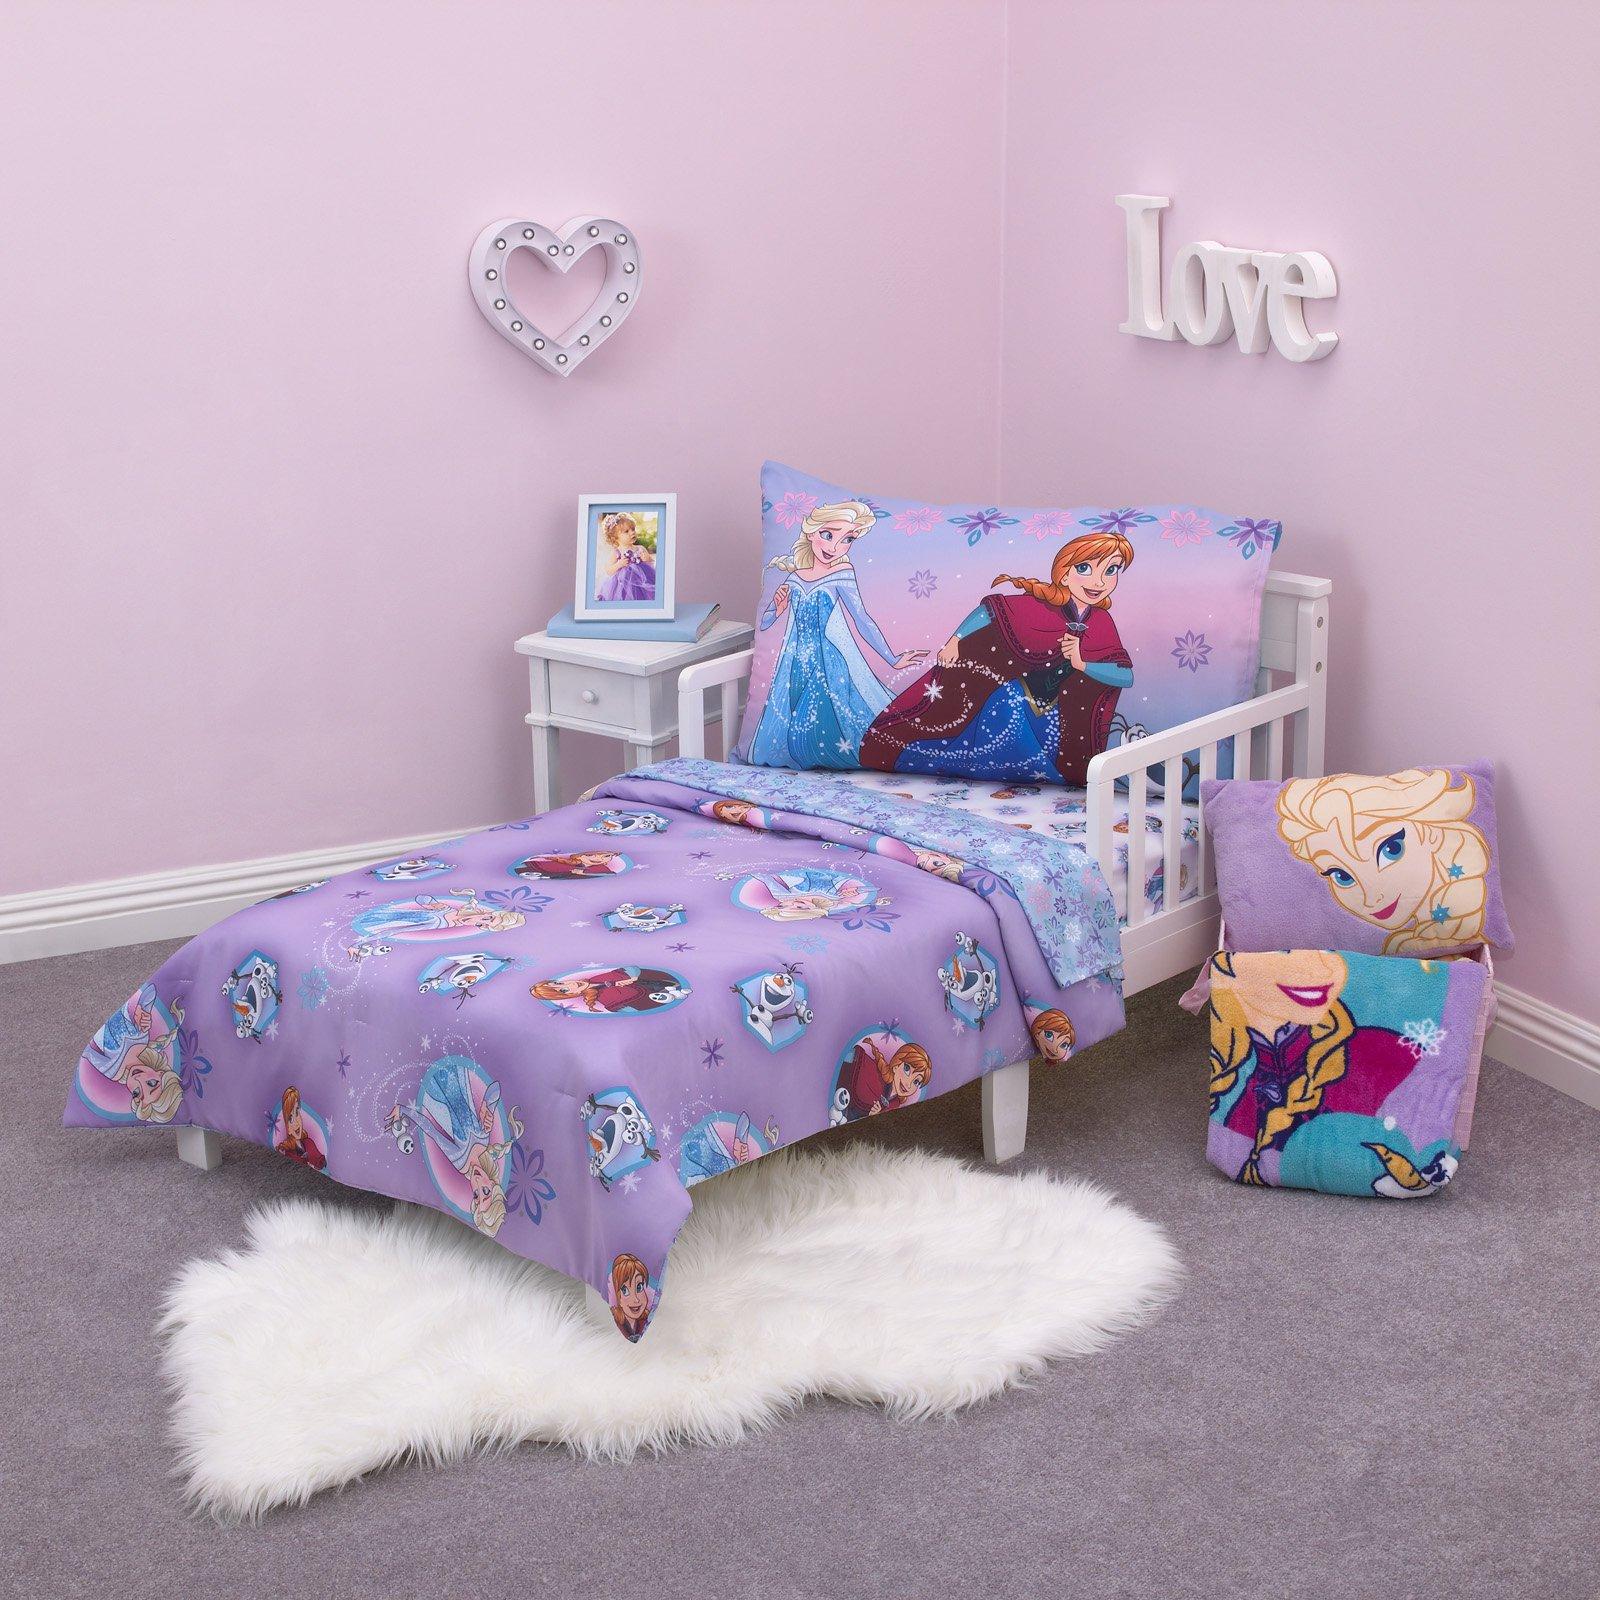 Disney Frozen Stirring up Fun 4 Piece Toddler Bedding Set